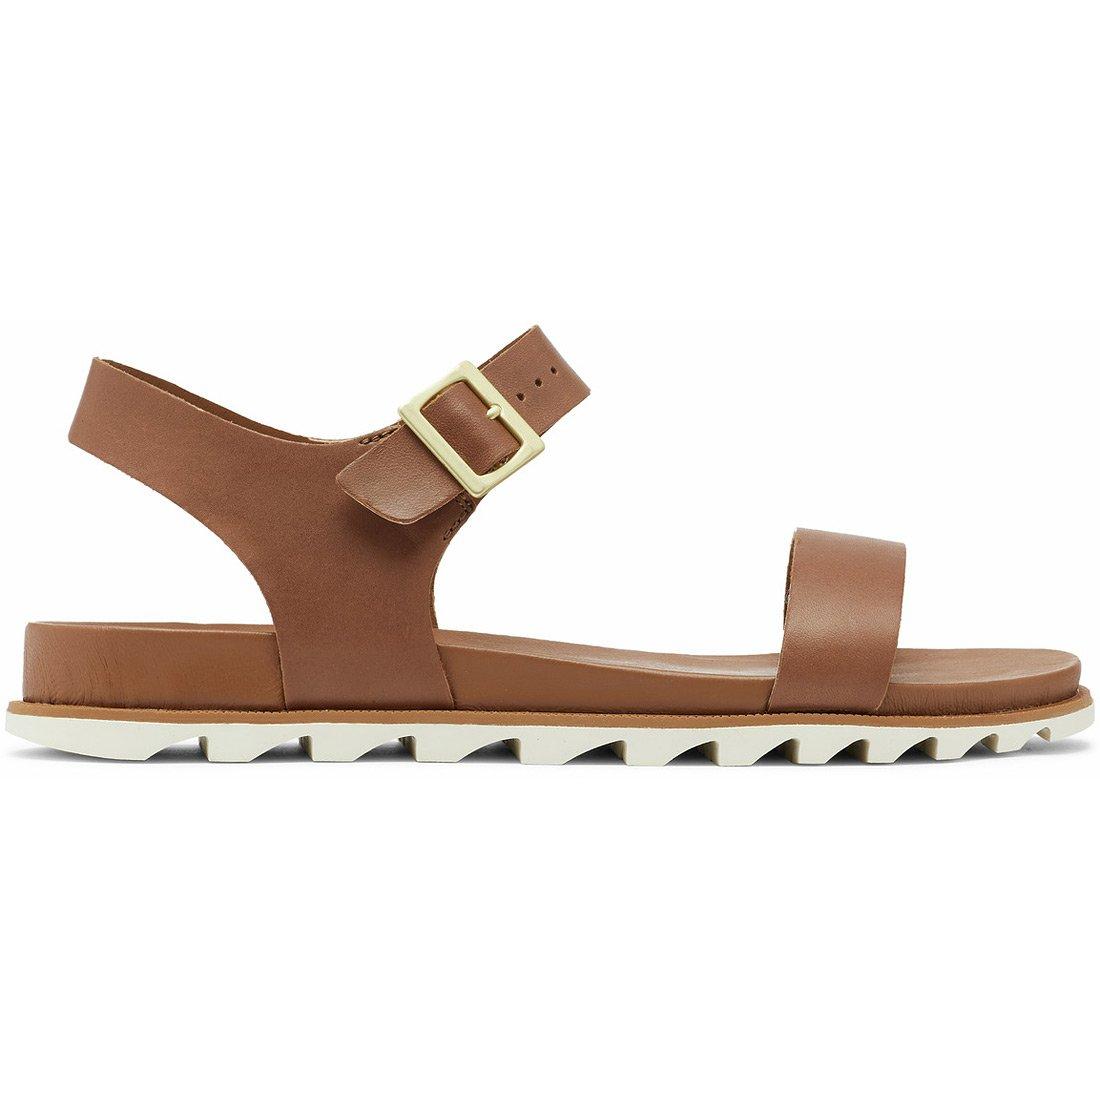 סנדלים לנשים - Roaming Decon Ankle Strap - Sorel